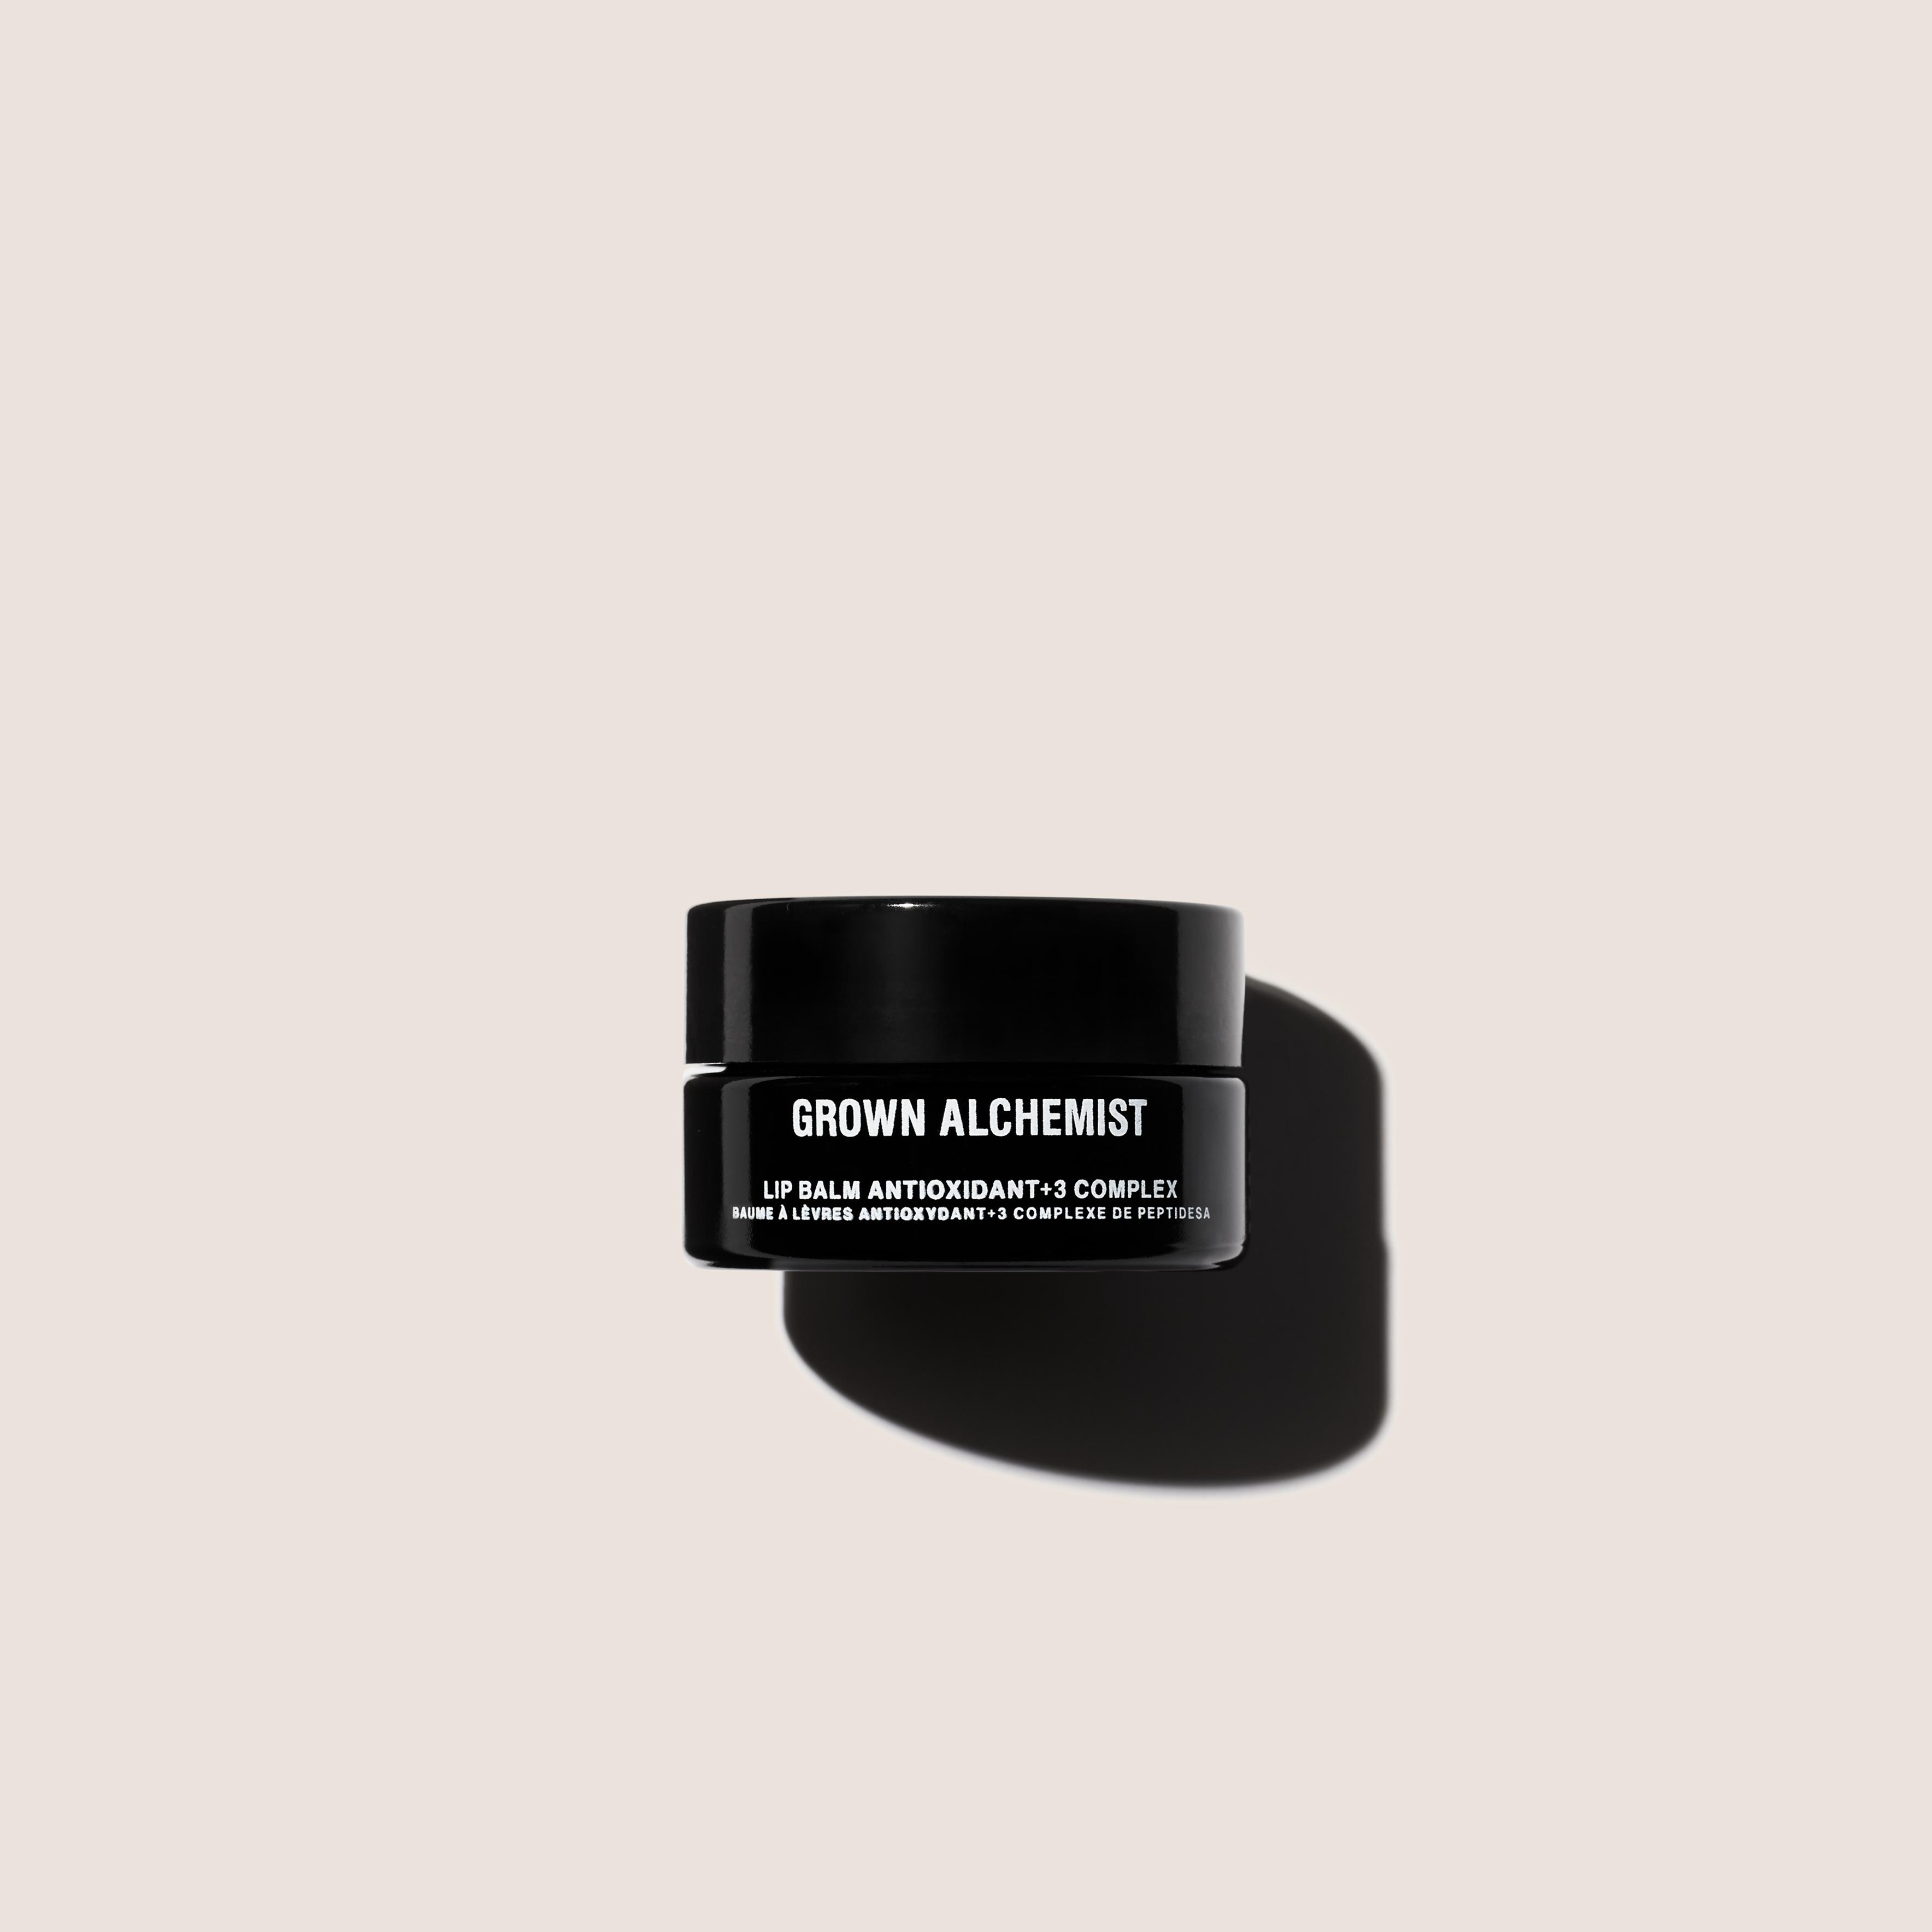 Lip Balm Antioxidant +3